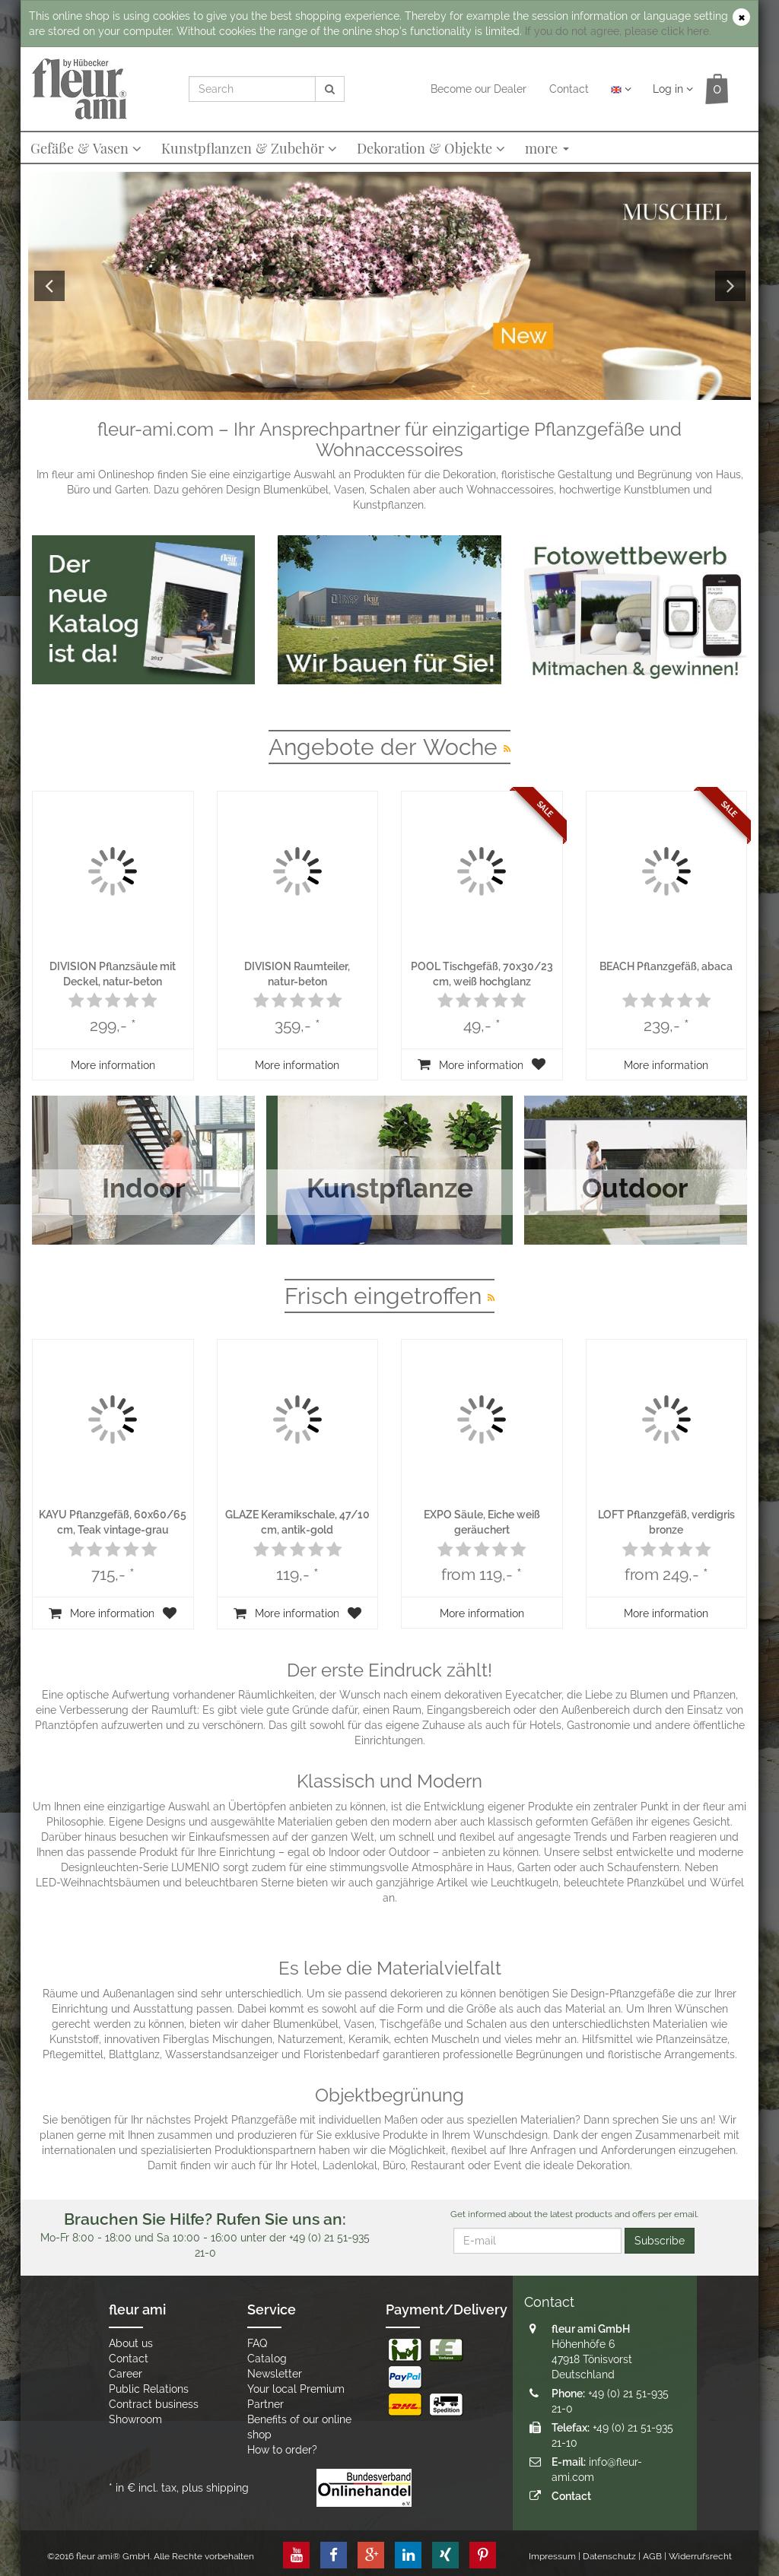 Fleur Ami Gmbh fleur ami competitors, revenue and employees - owler company profile